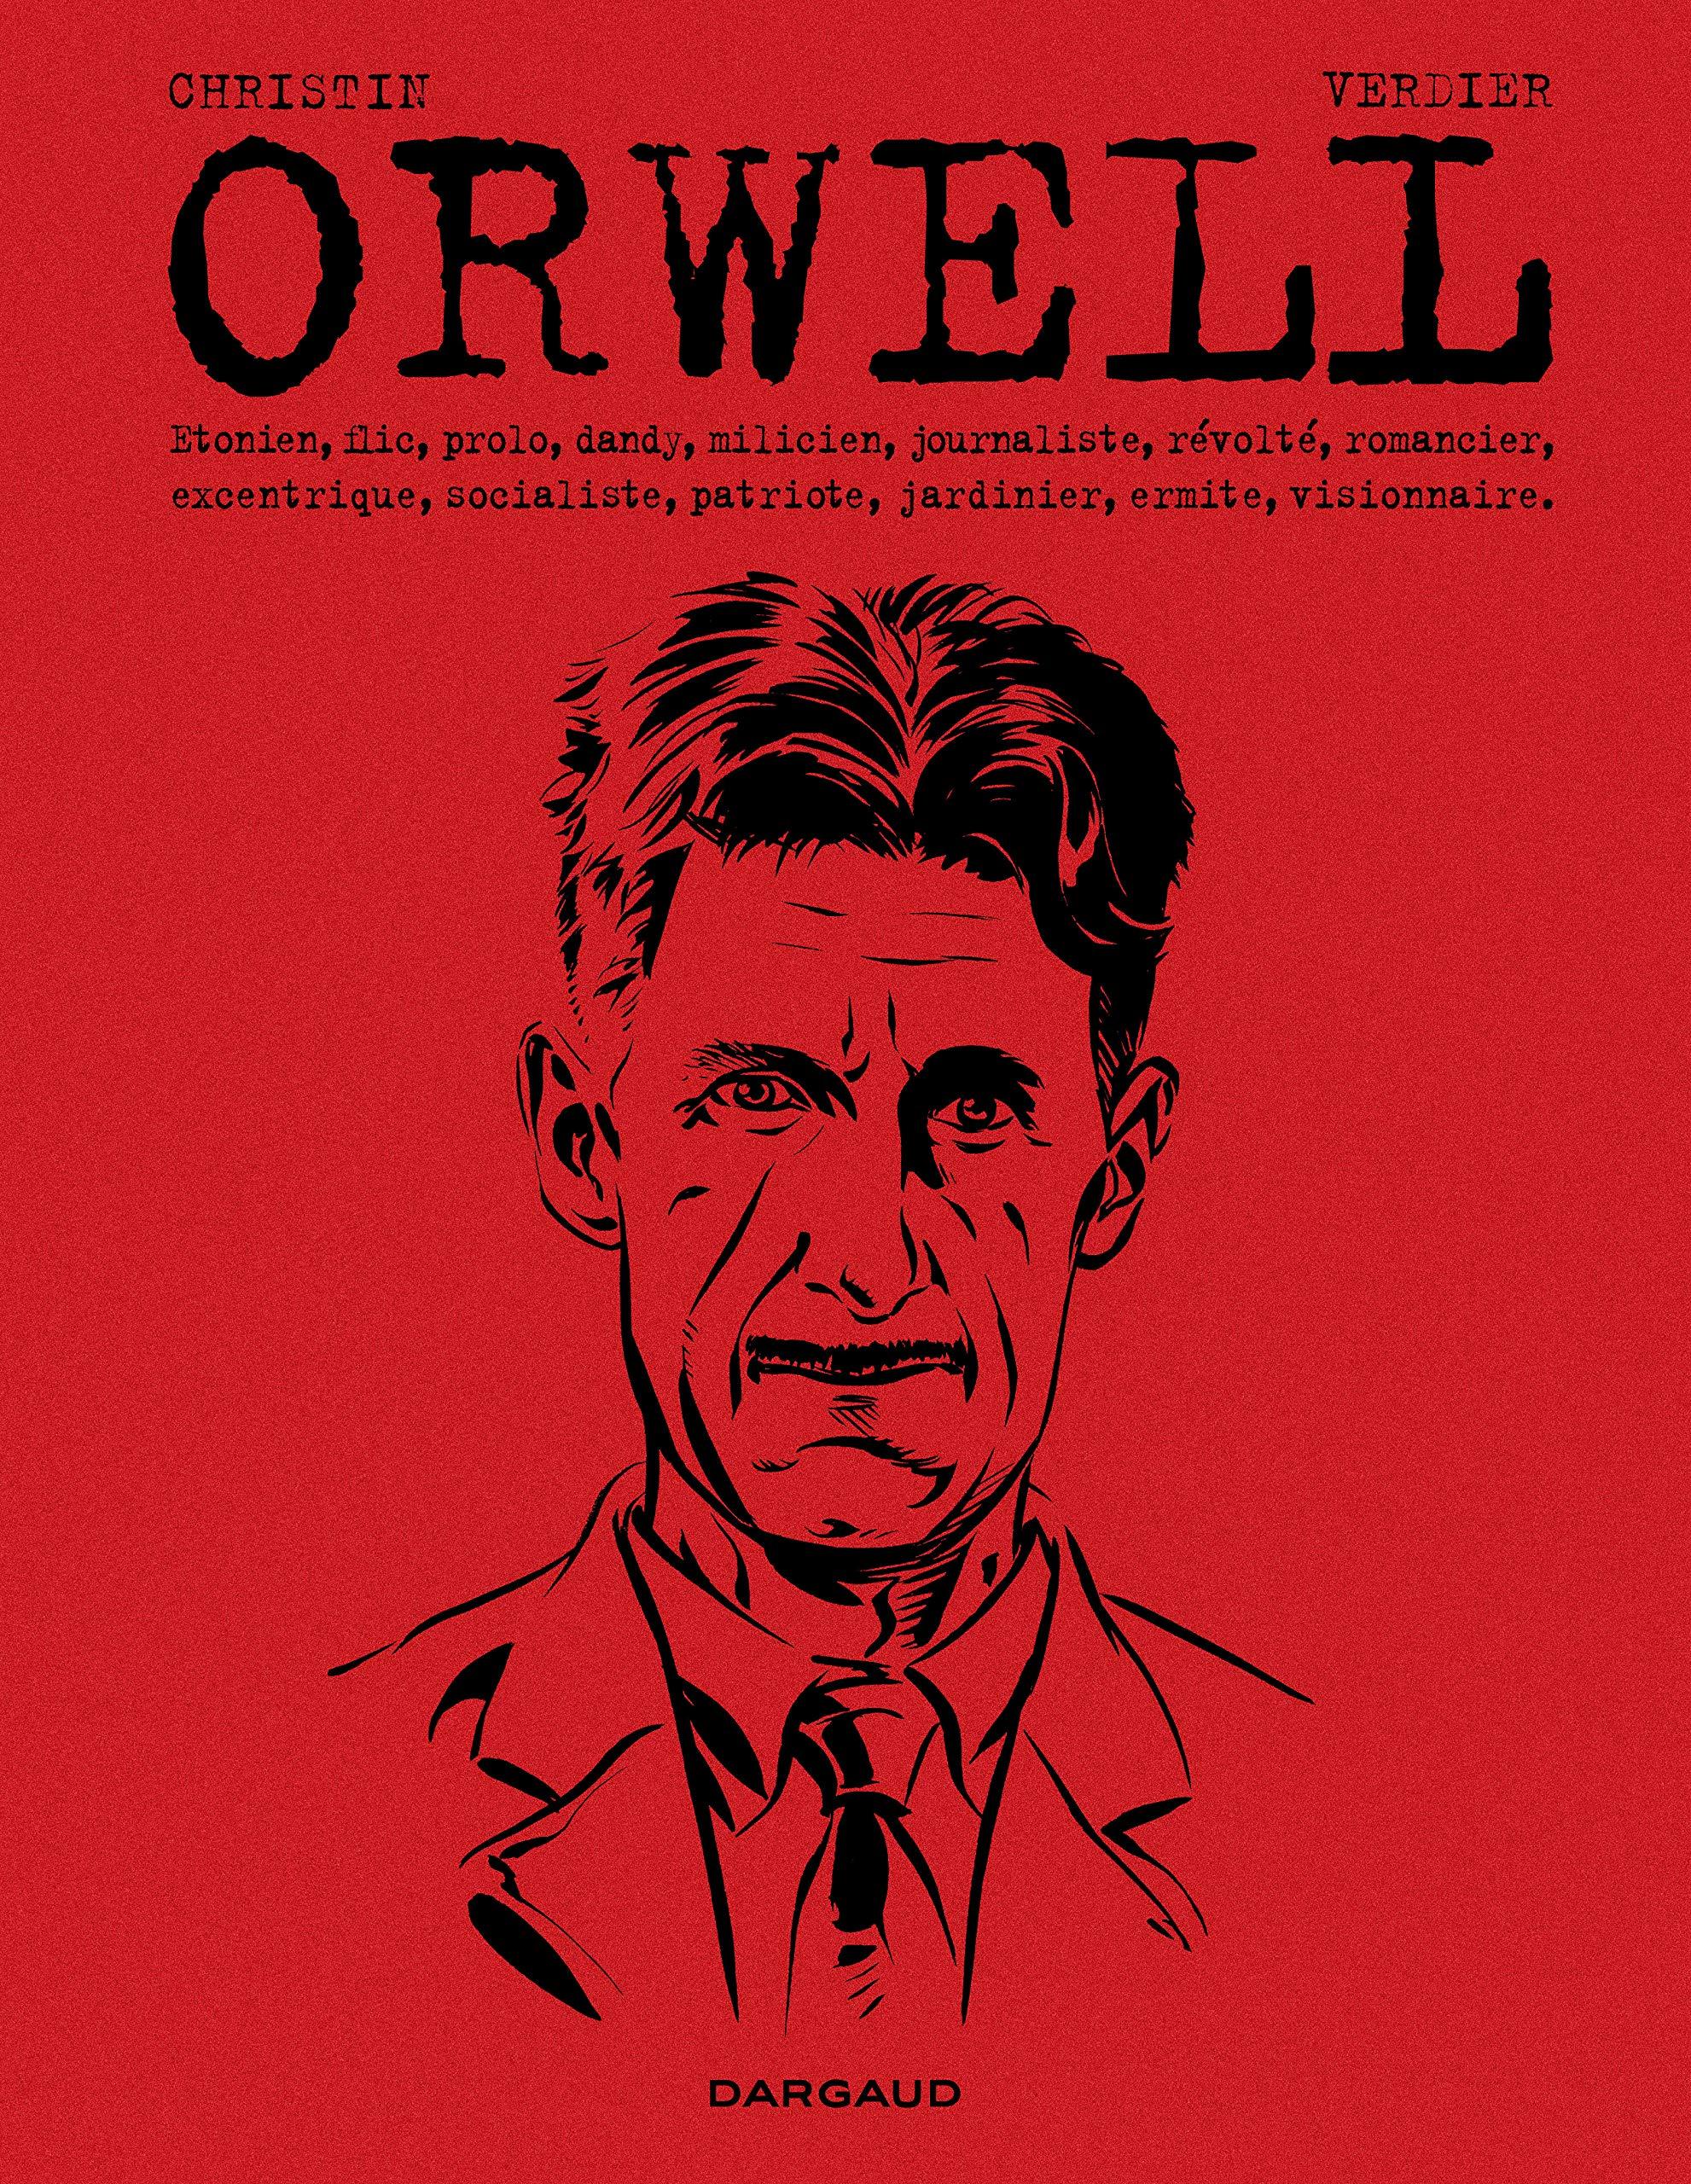 George Orwell - tome 0 - Orwell: Amazon.es: Christin Pierre ...